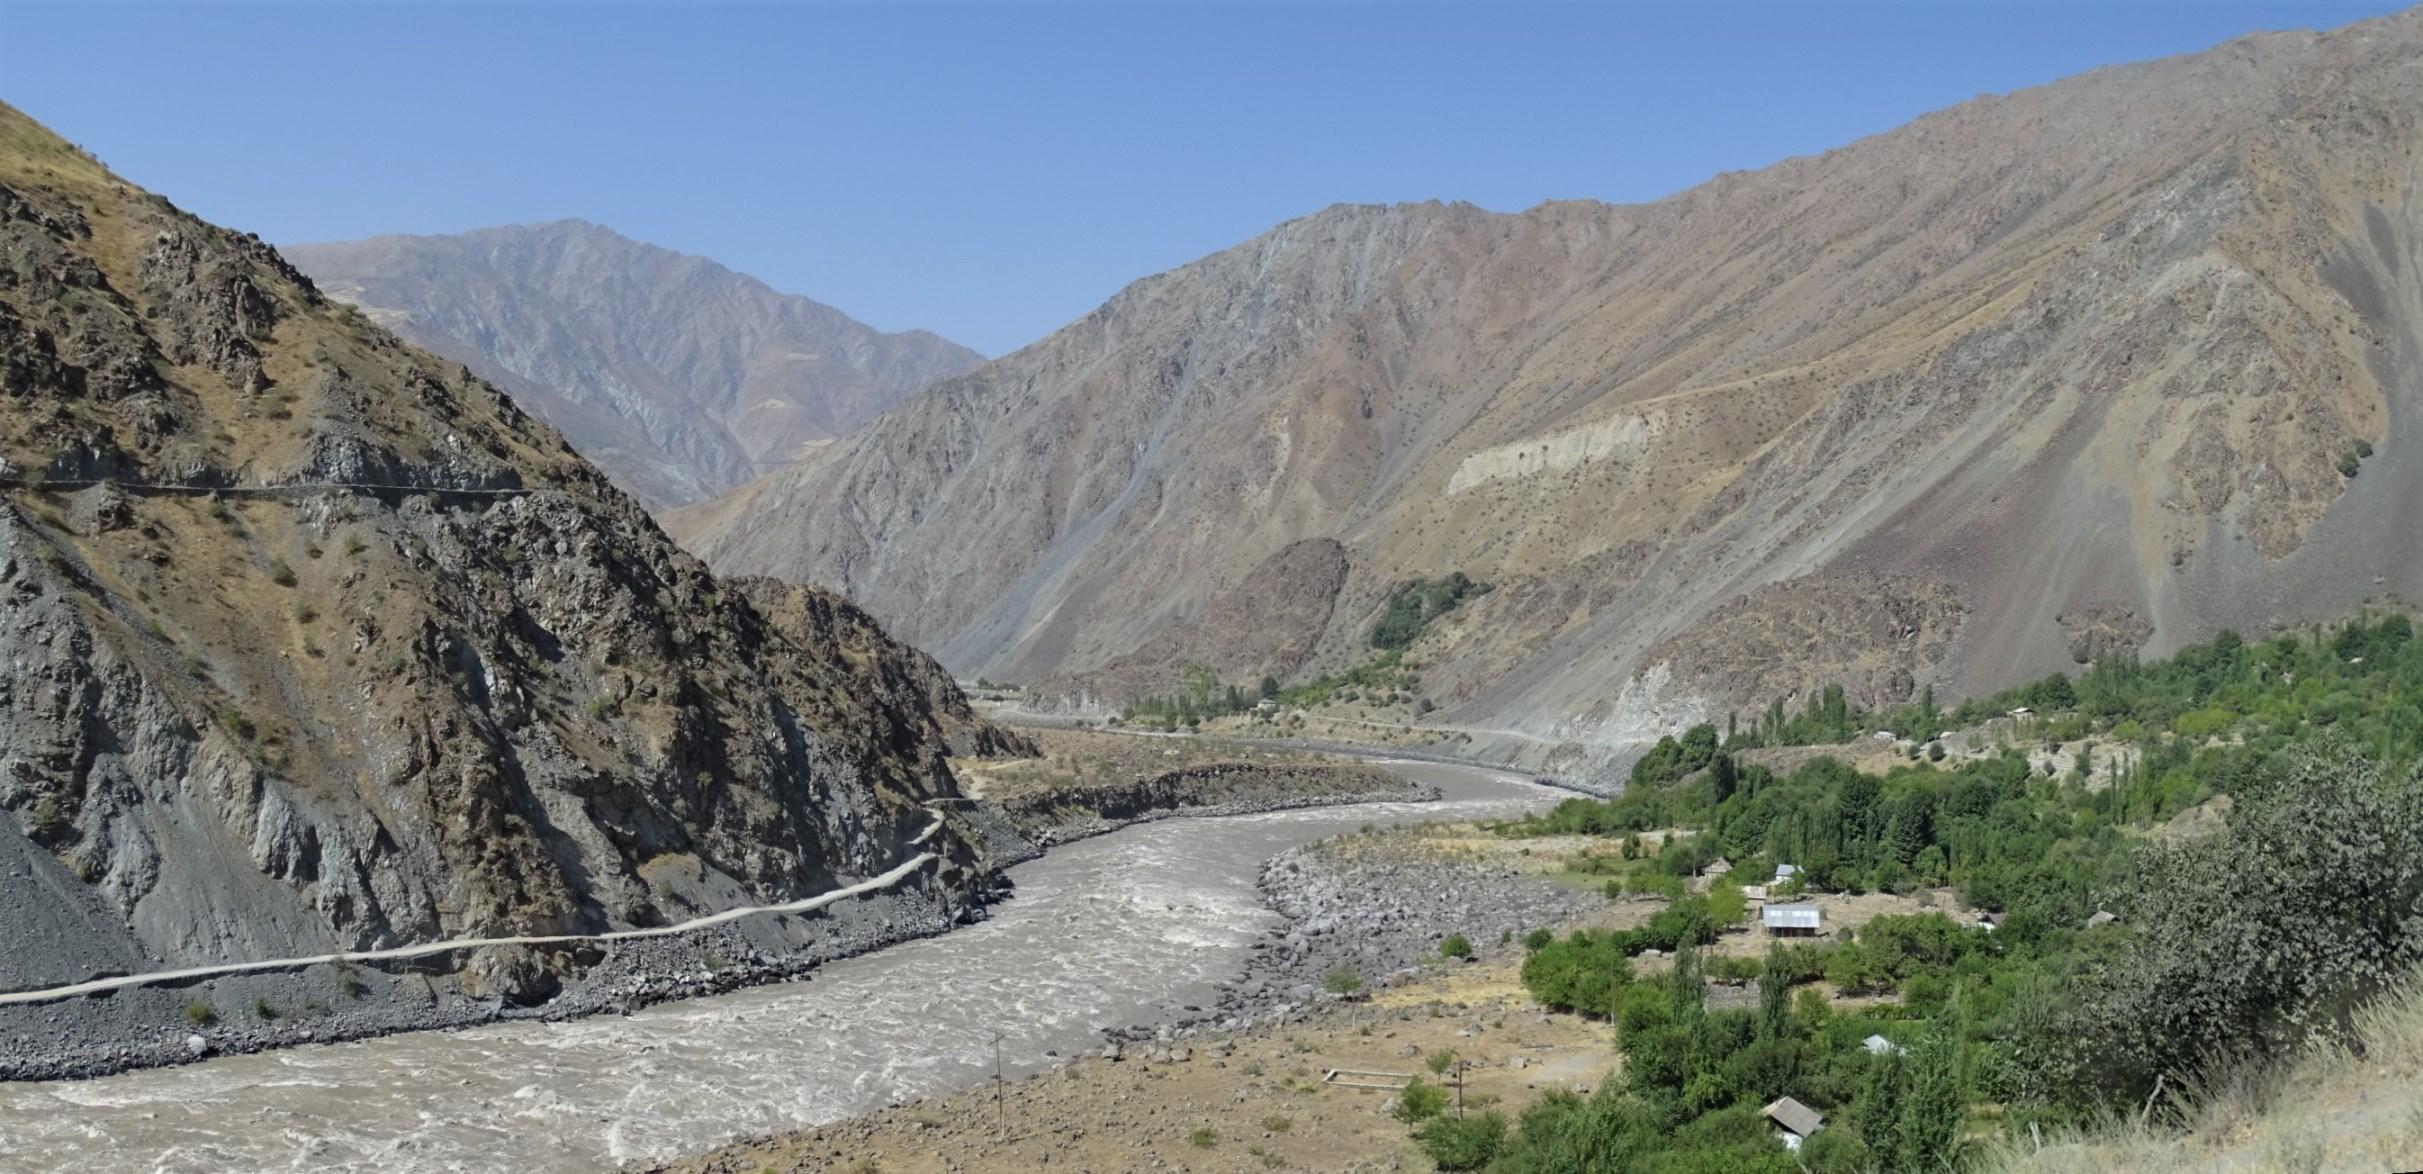 Panj River, Rushan Valley, Tajikistan